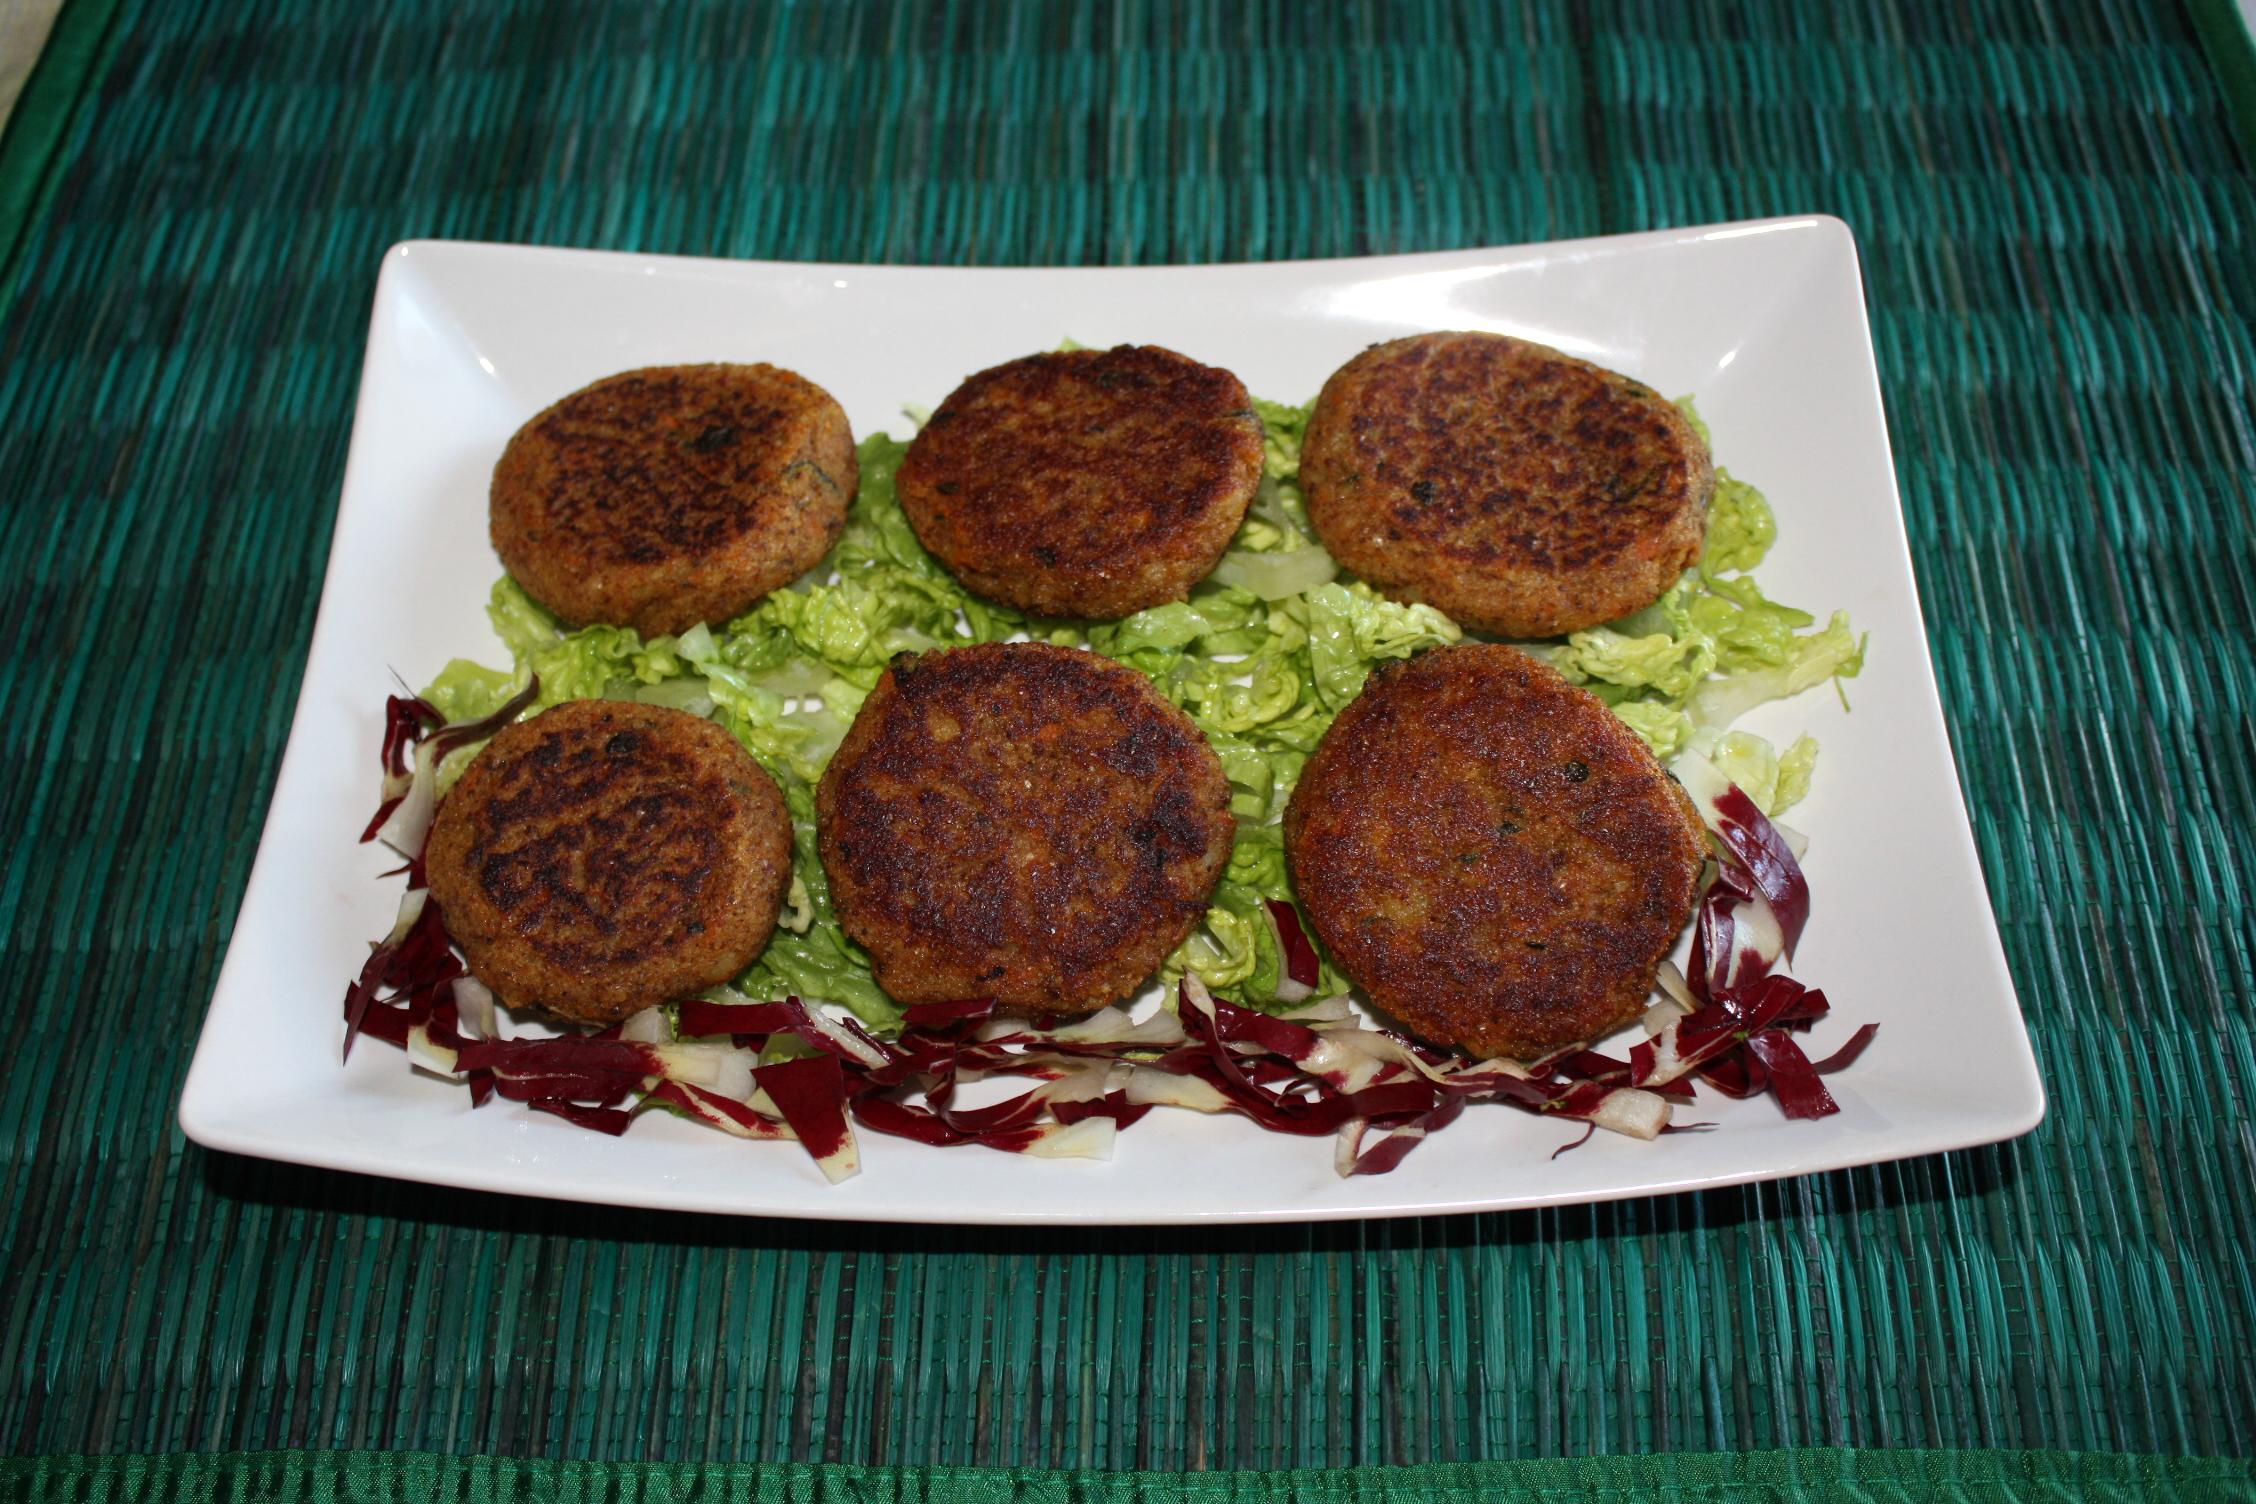 Miniburger Alle Verdure – Piatto Pronto